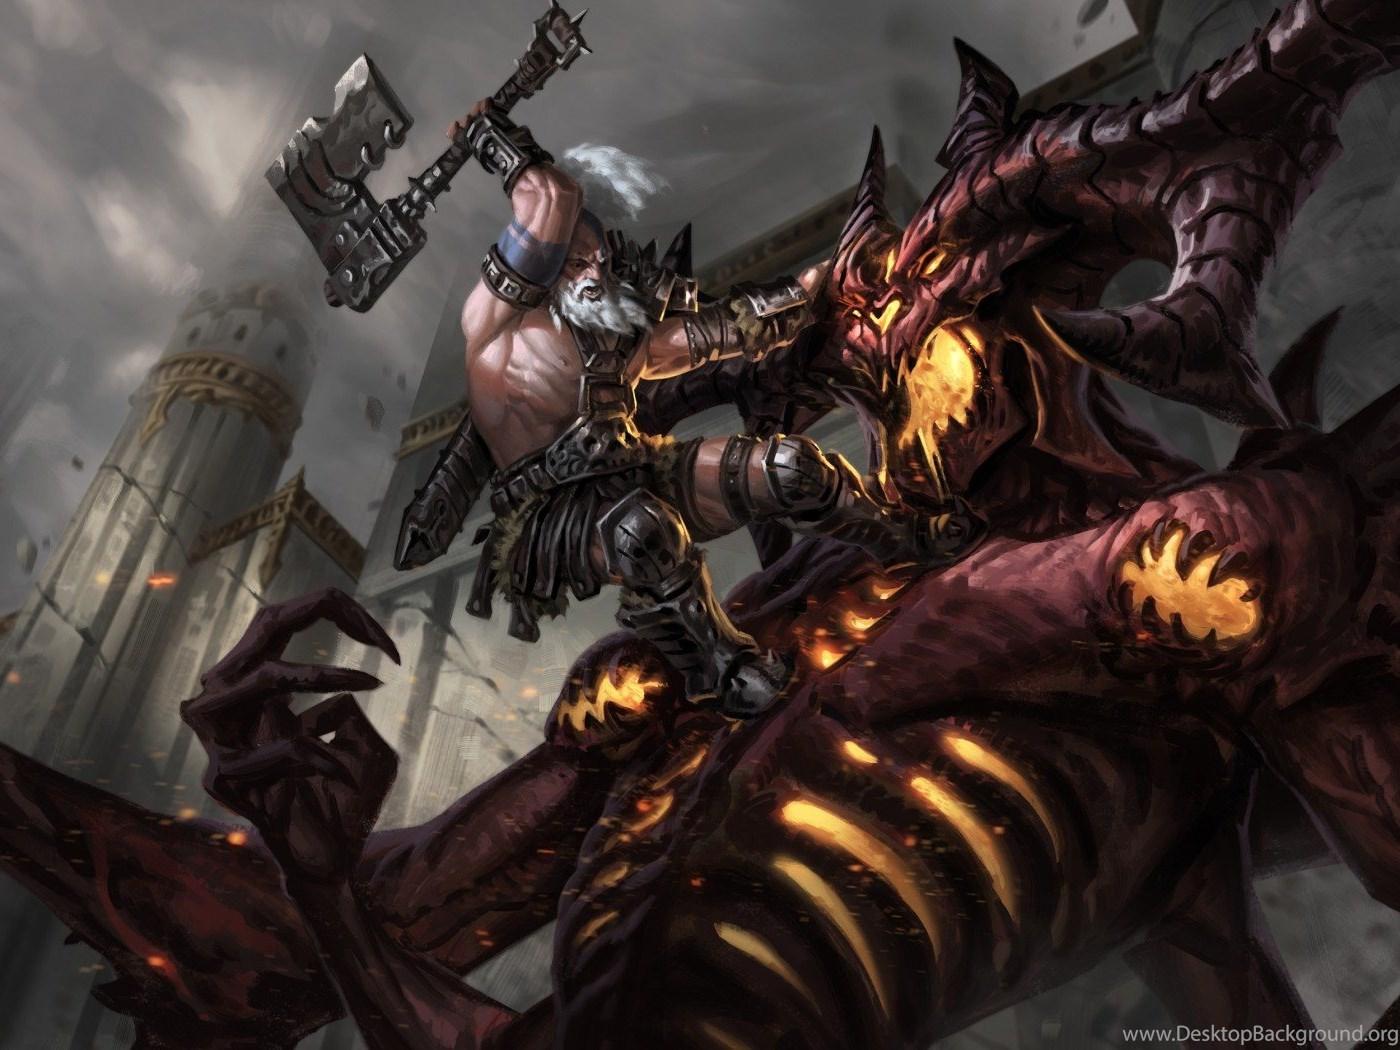 Diablo 3 Reaper Of Souls Wallpapers: Download Wallpapers Diablo 3, Reaper Of Souls, Rpg